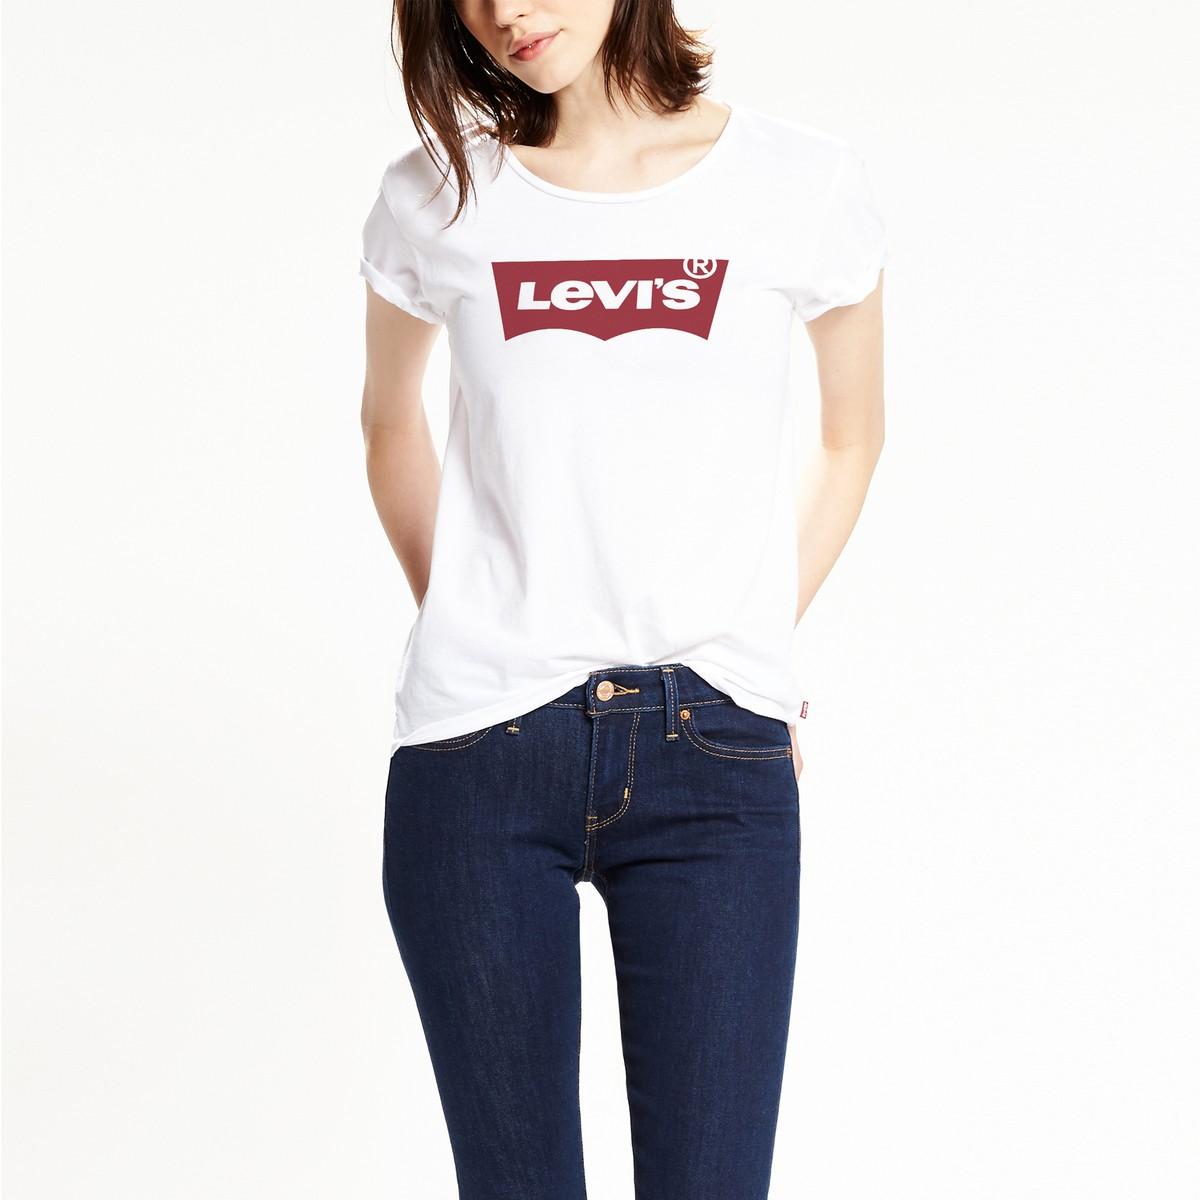 Camiseta Novedades Perfect Levis Las Tee' 'the 0Fnq01Cr